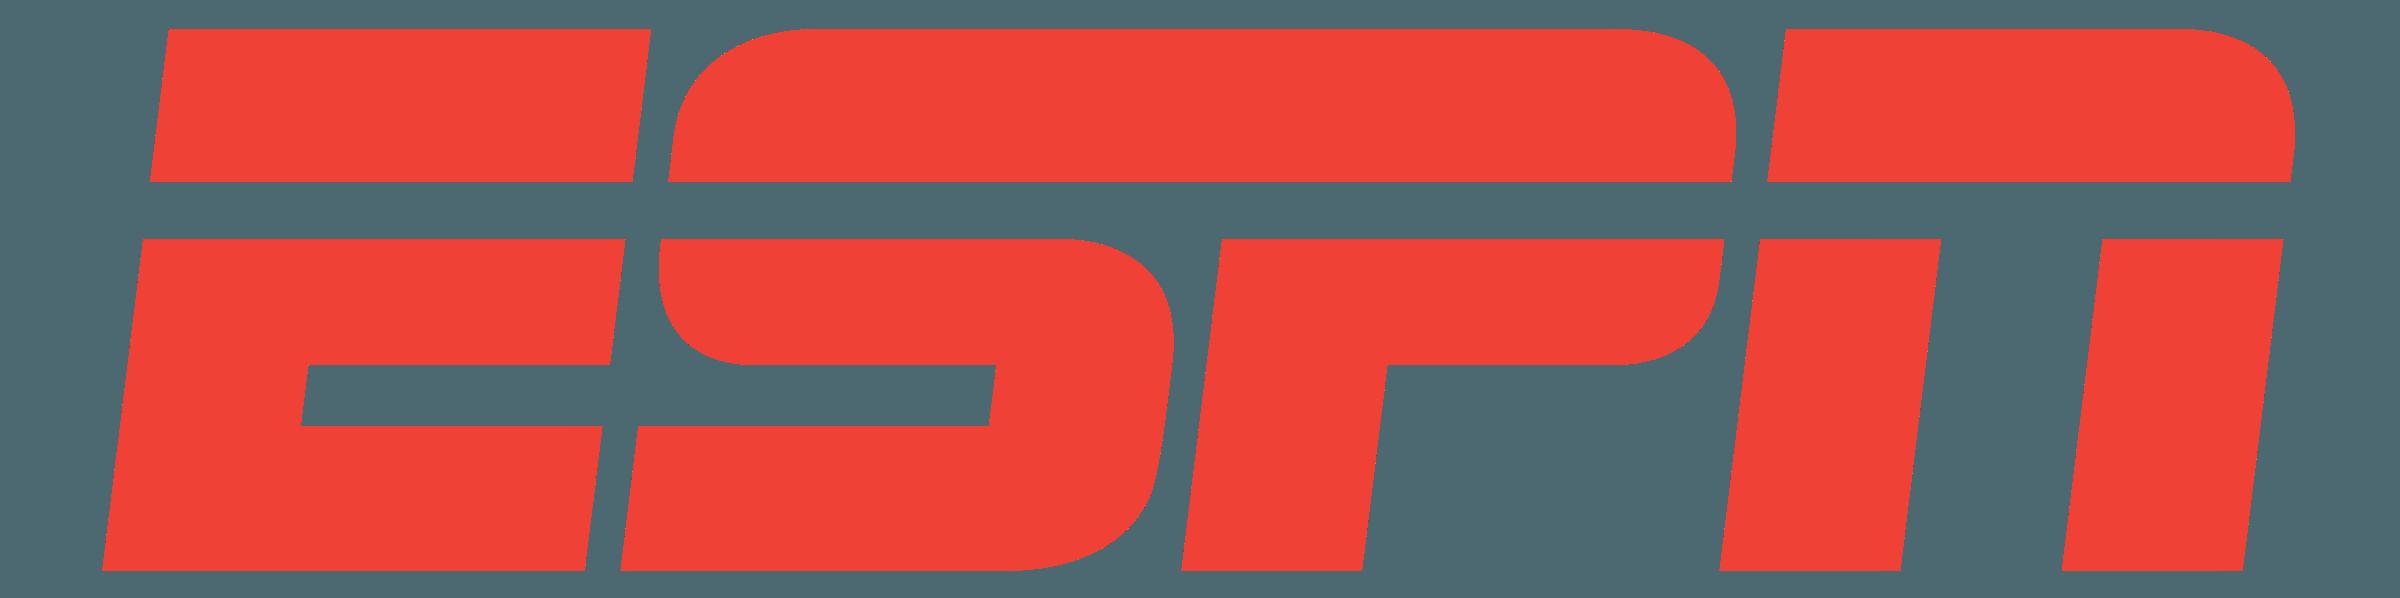 ESPN Logo PNG Transparent & SVG Vector.